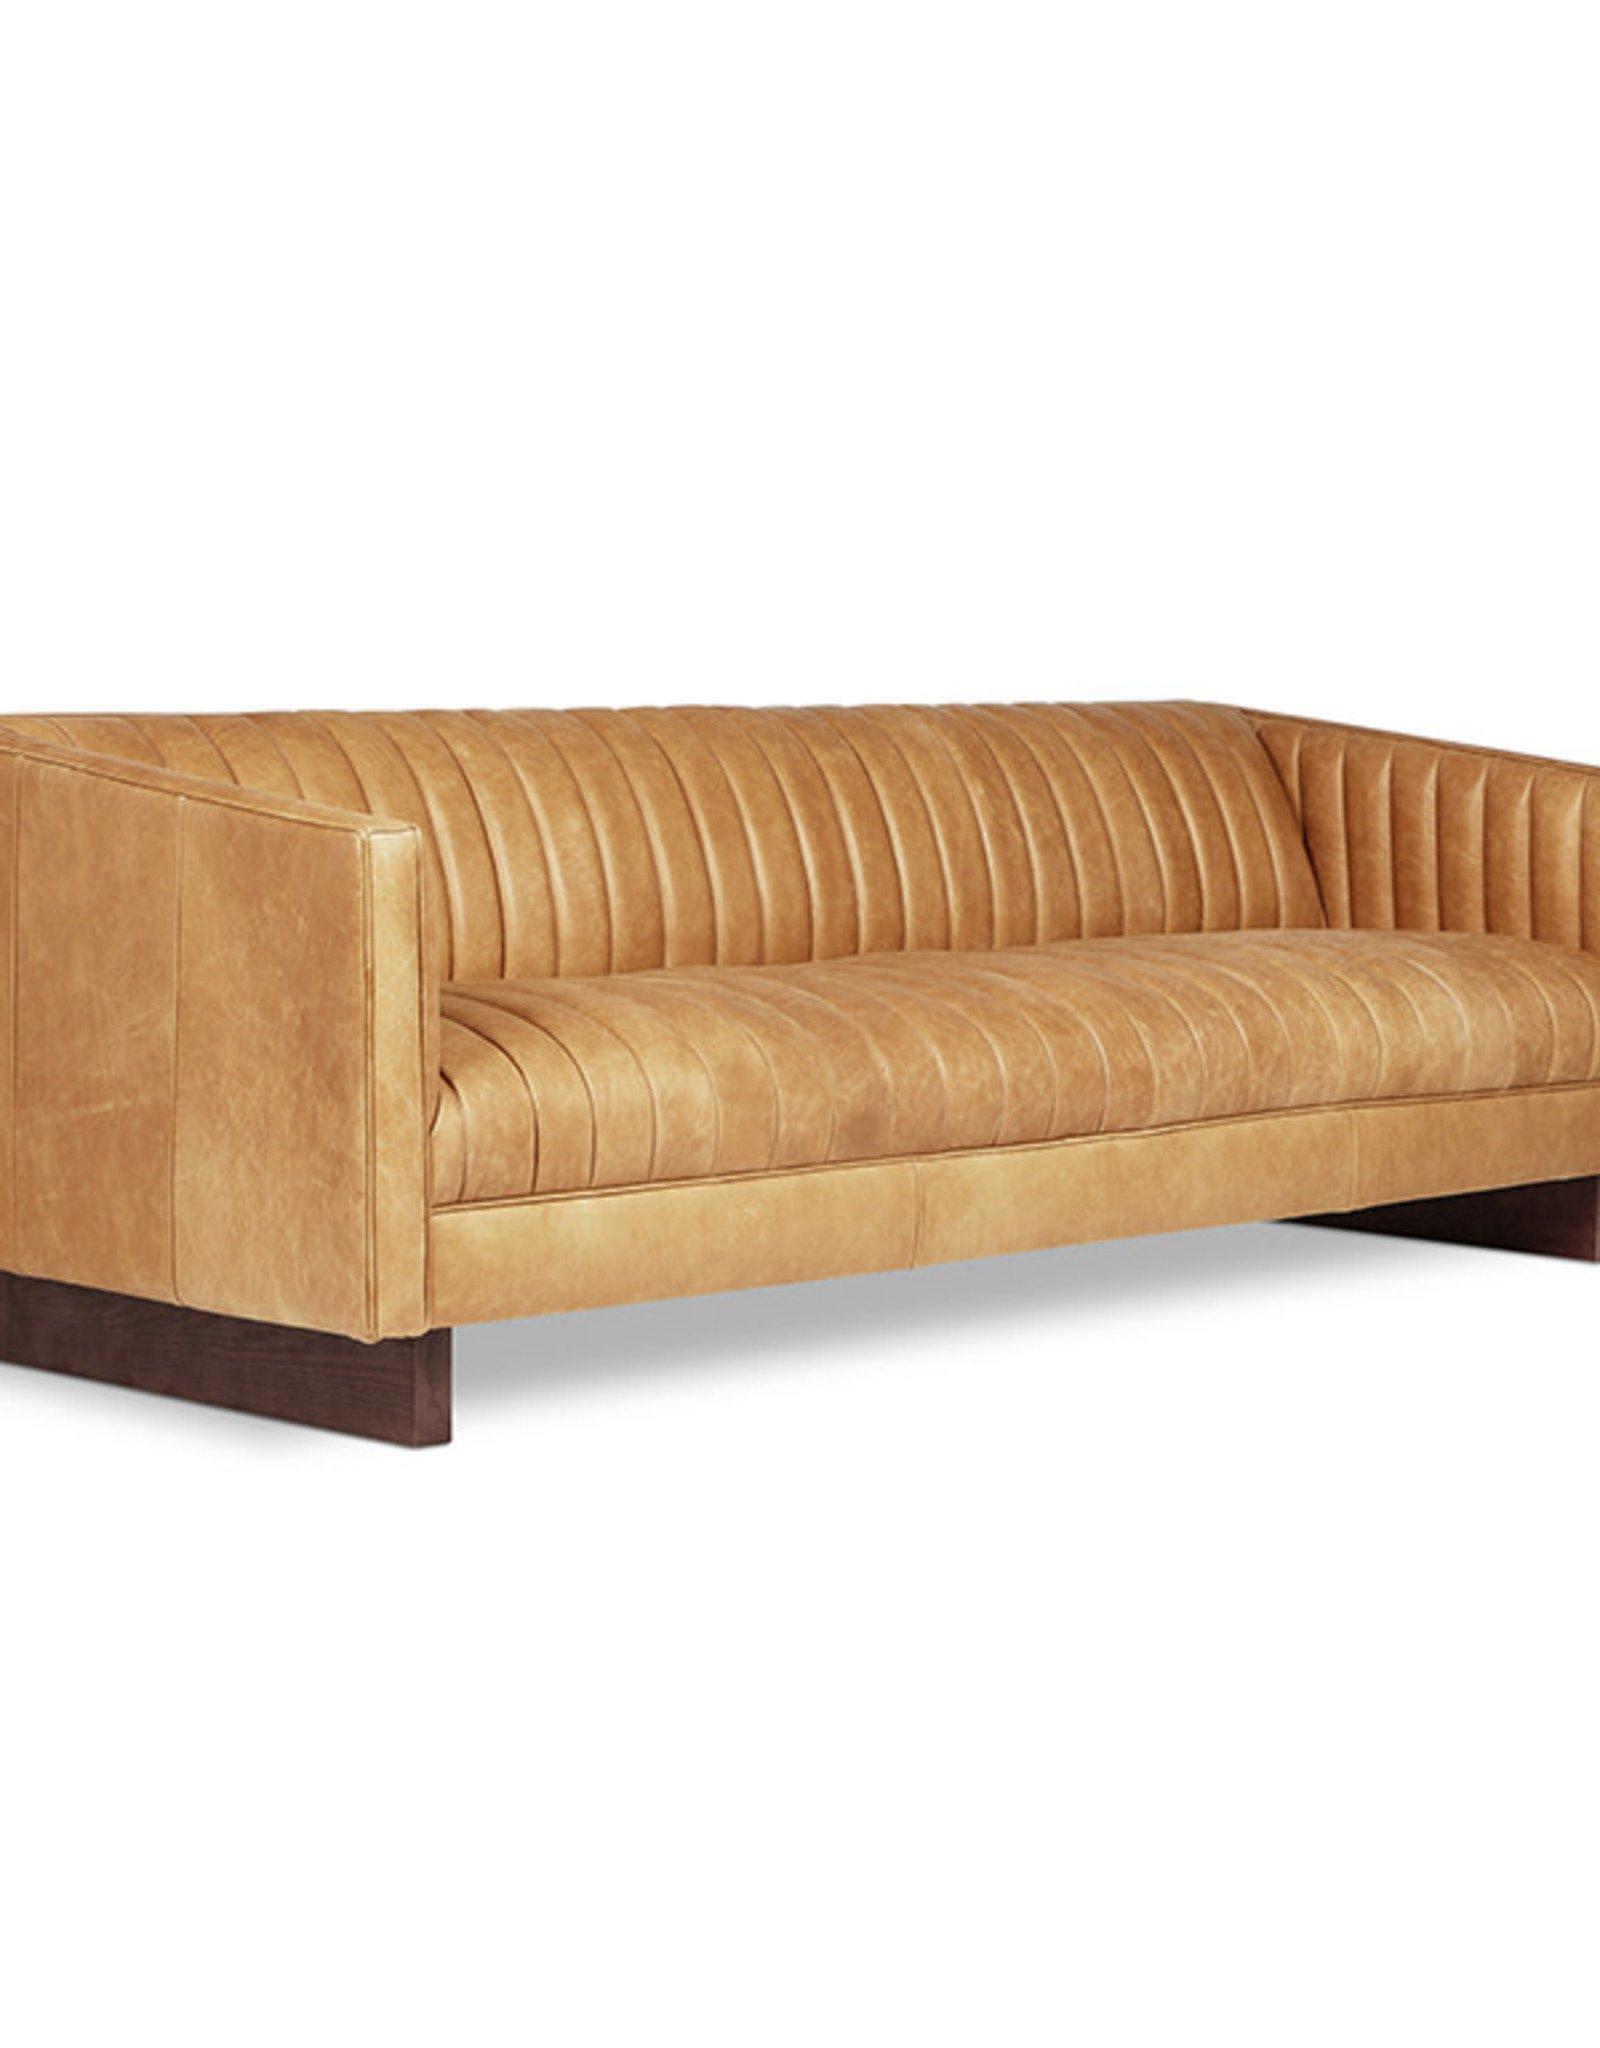 Gus* Modern Wallace Sofa